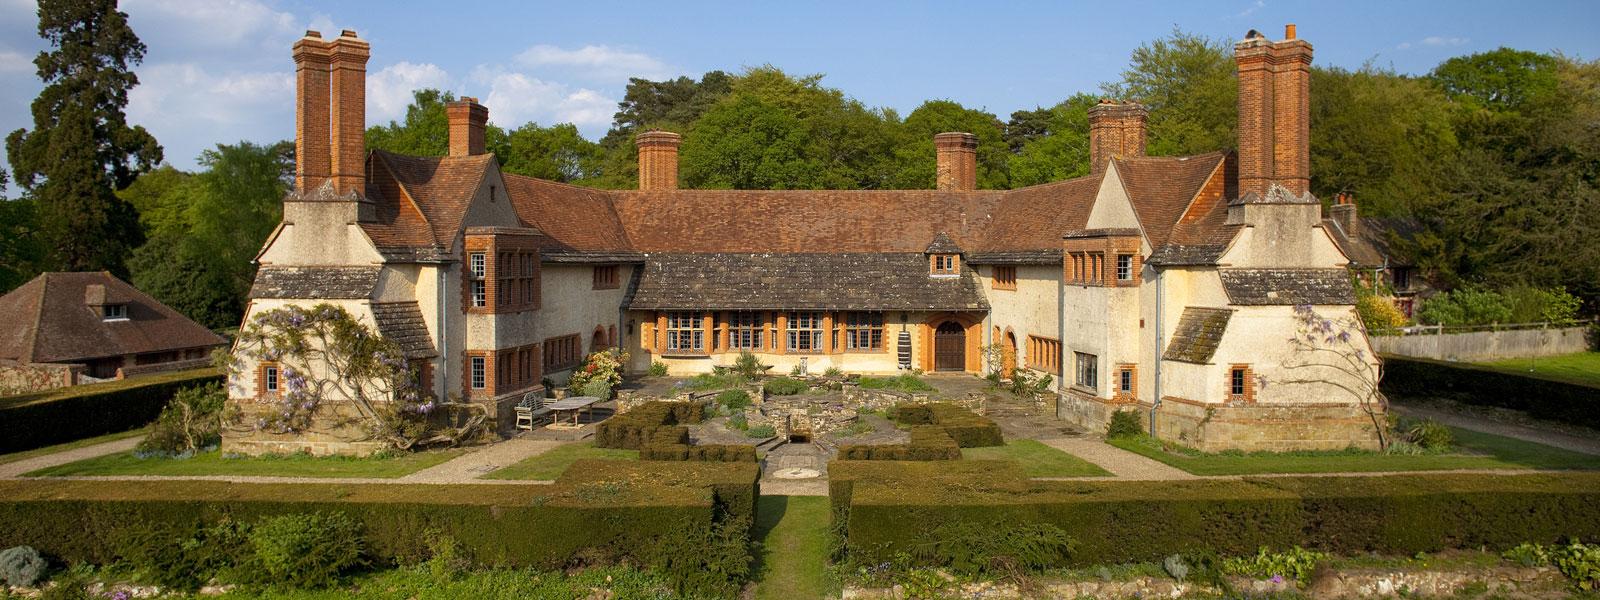 Home Surrey Historic Buildings Trust